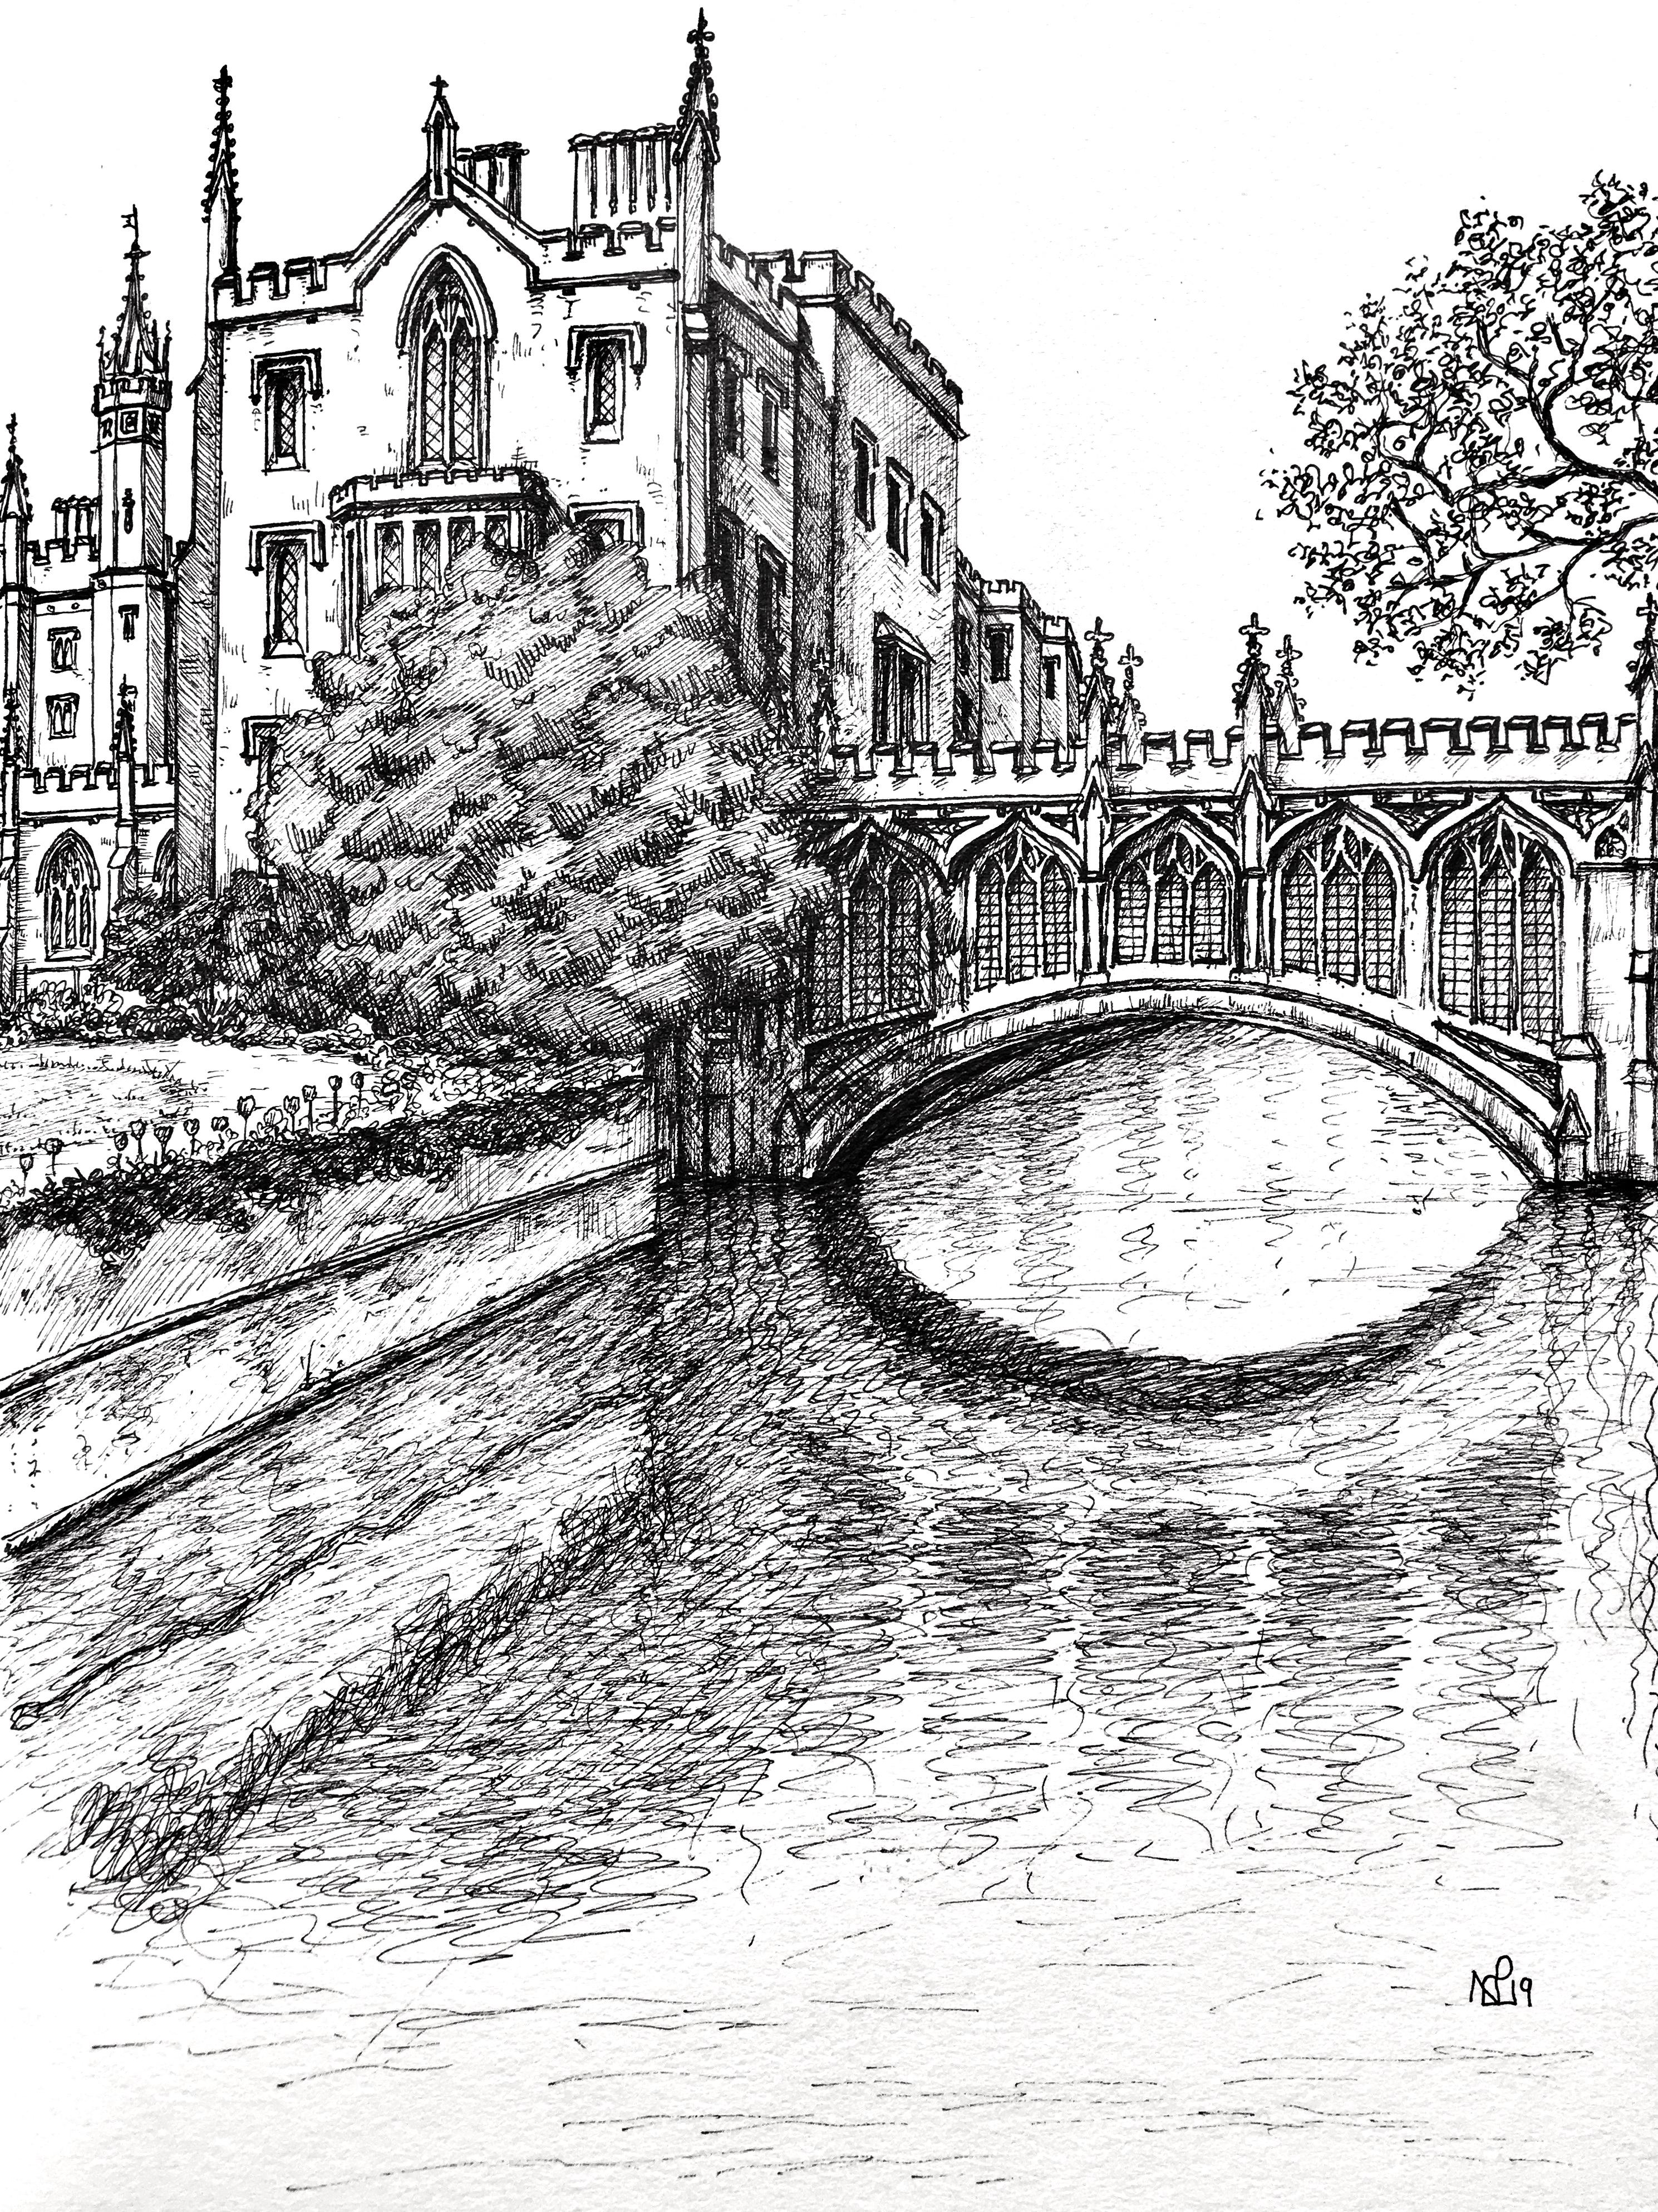 St Johns sketch